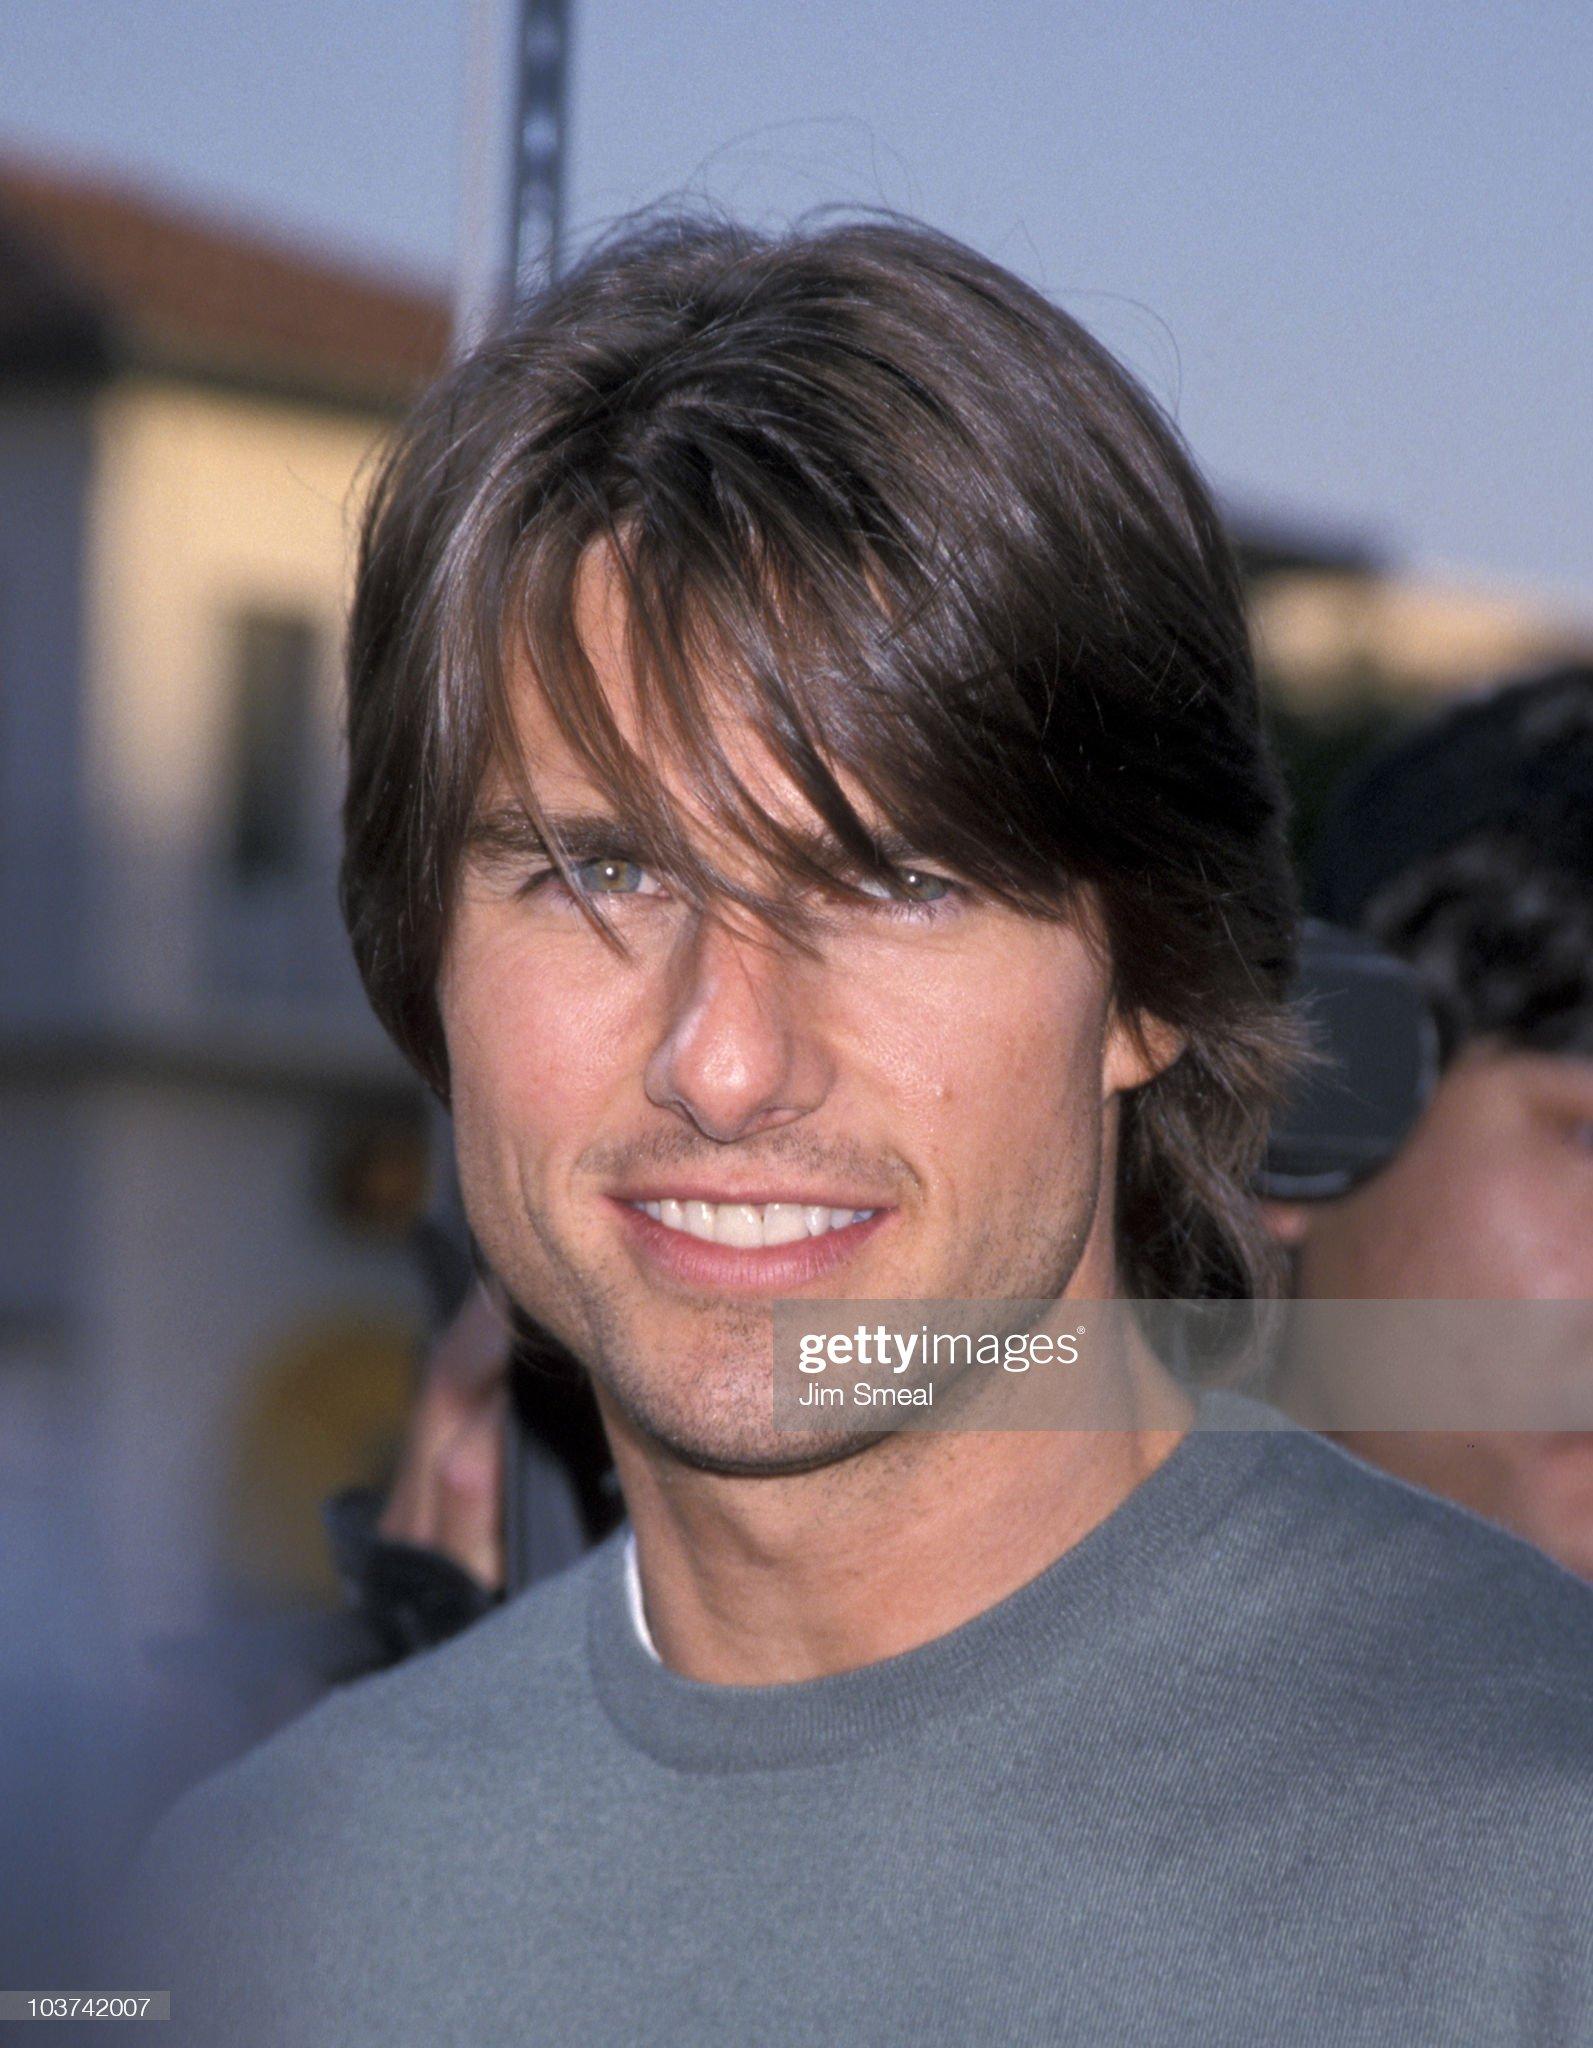 Tom Cruise (Galería de fotos) Tom-cruise-picture-id103742007?s=2048x2048